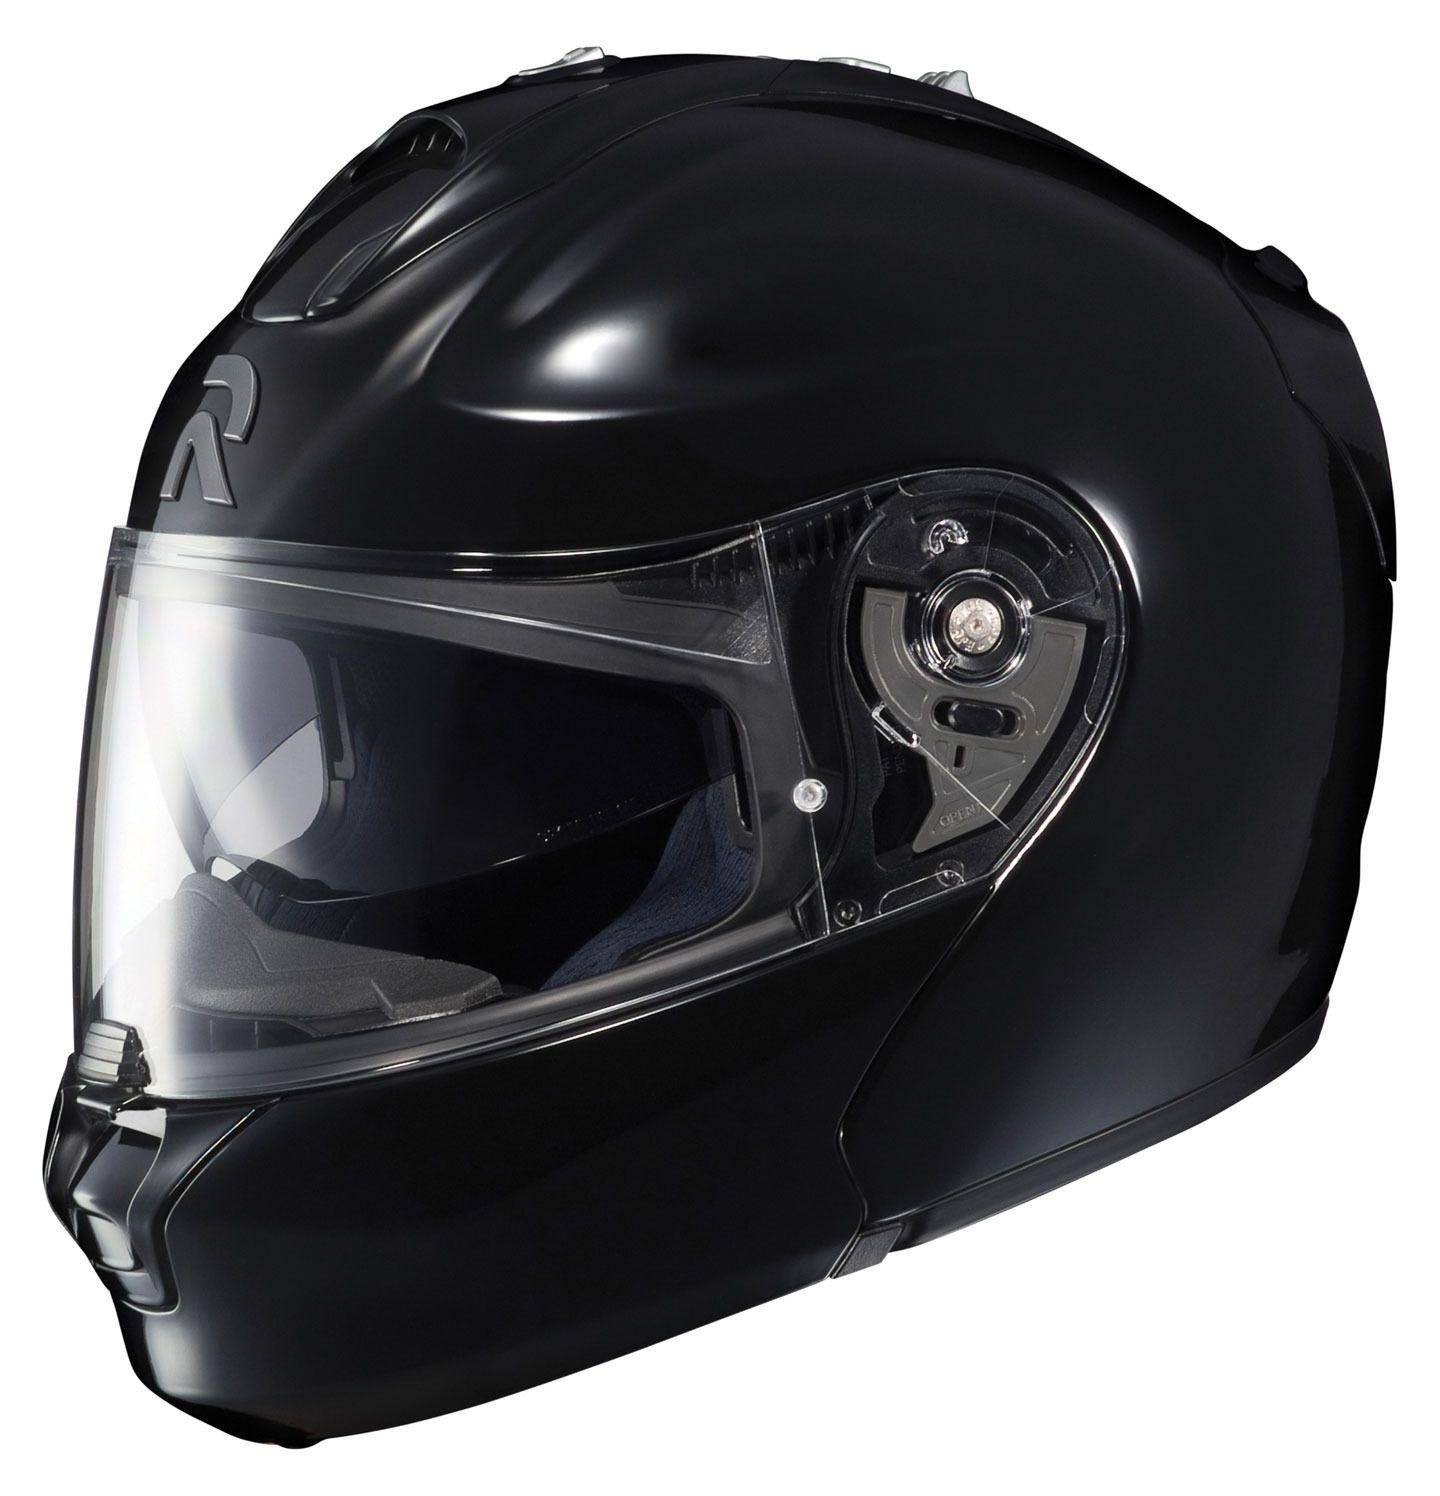 hjc rpha max helmet solid revzilla. Black Bedroom Furniture Sets. Home Design Ideas